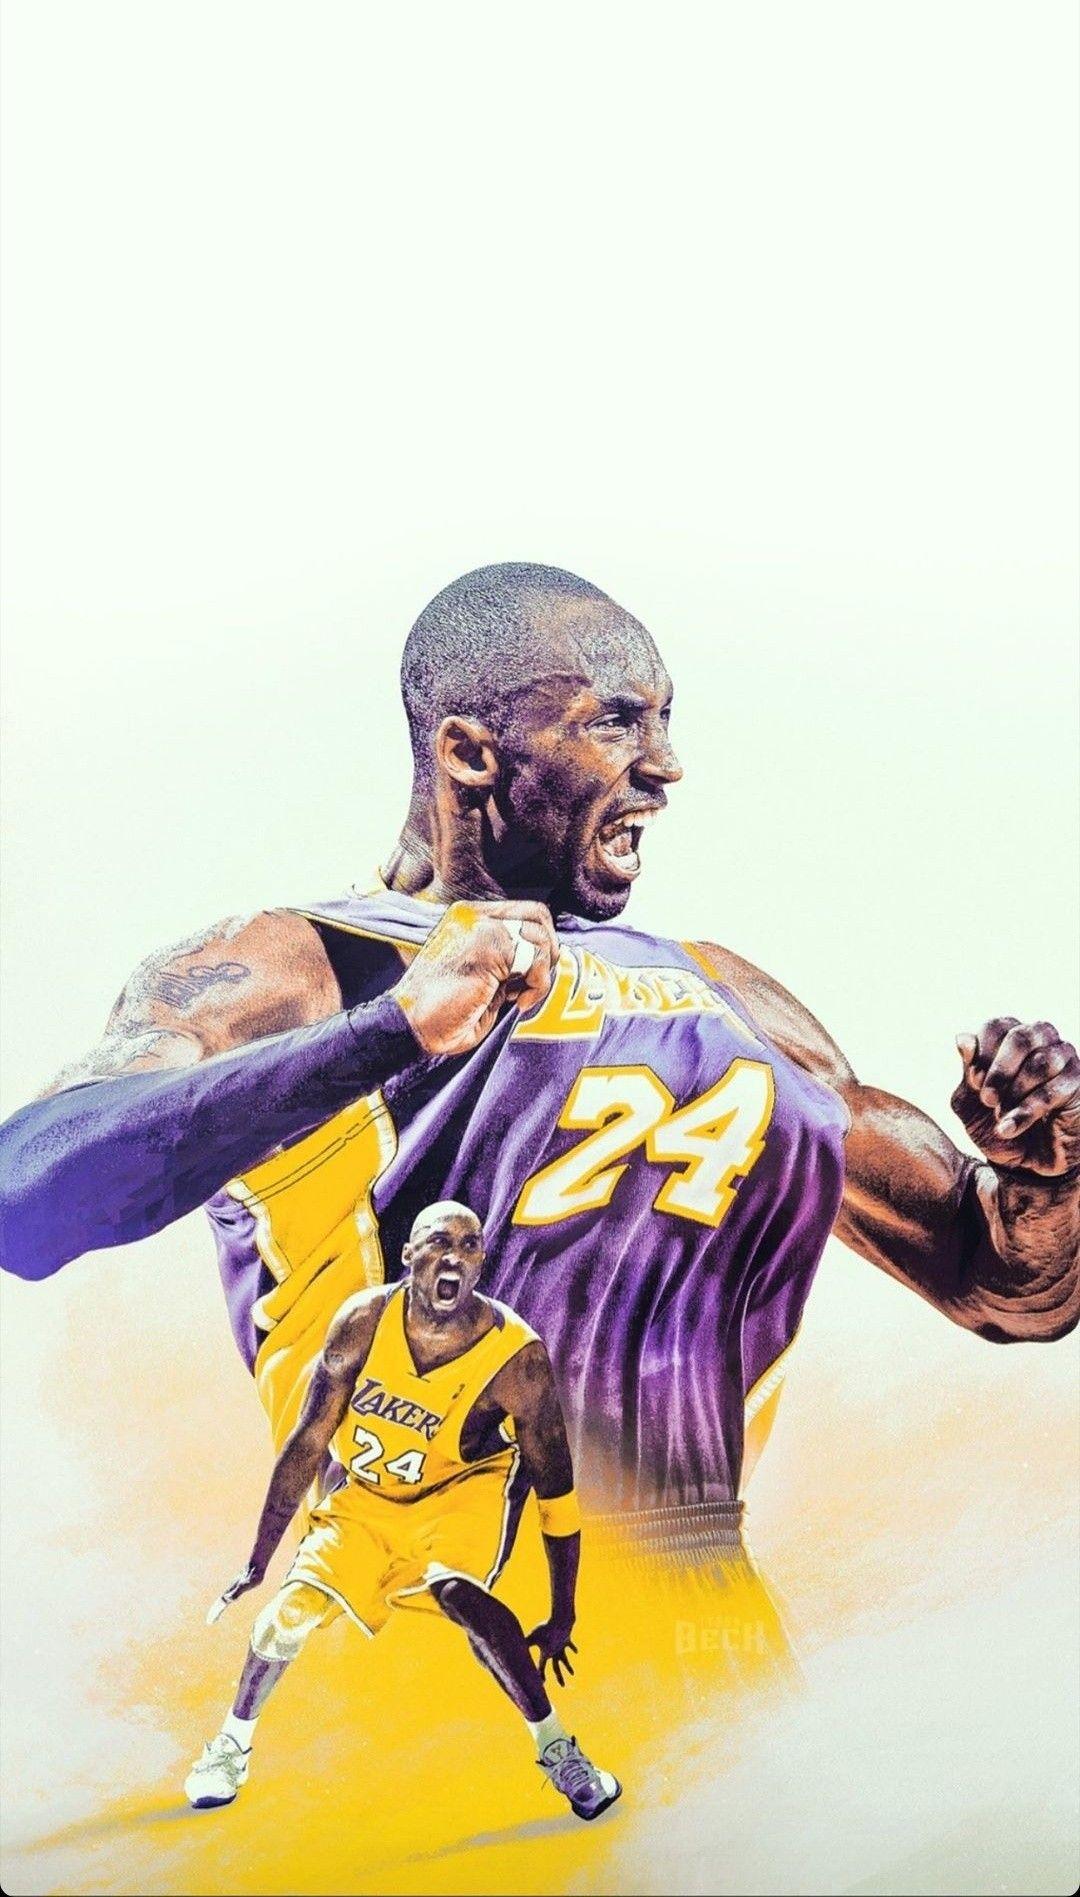 Kobe Bryant Wallpaper In 2020 Kobe Bryant Wallpaper Kobe Bryant Kobe Bryant Pictures